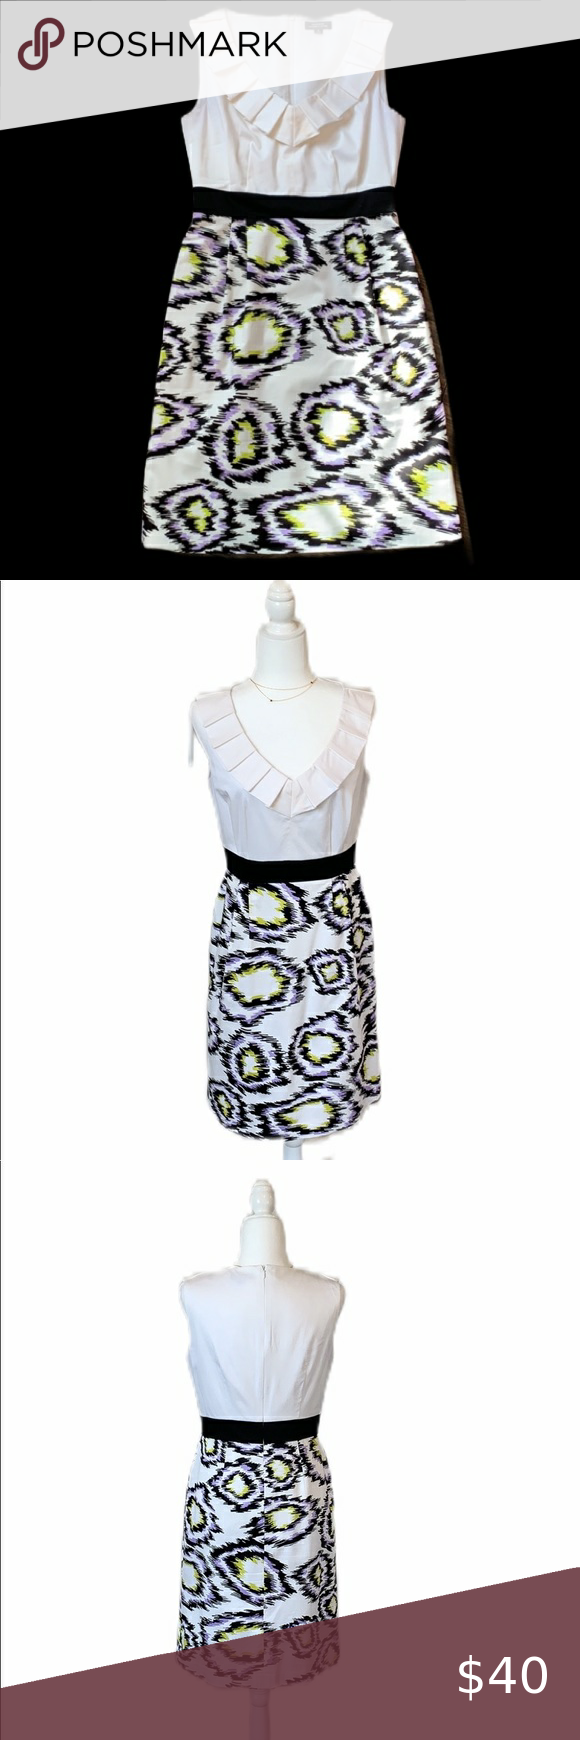 Tahari White Purple V Neck Sheath Dress Size 6 In 2020 Sheath Dress Sleeveless Sheath Dress Colorful Dresses [ 1740 x 580 Pixel ]